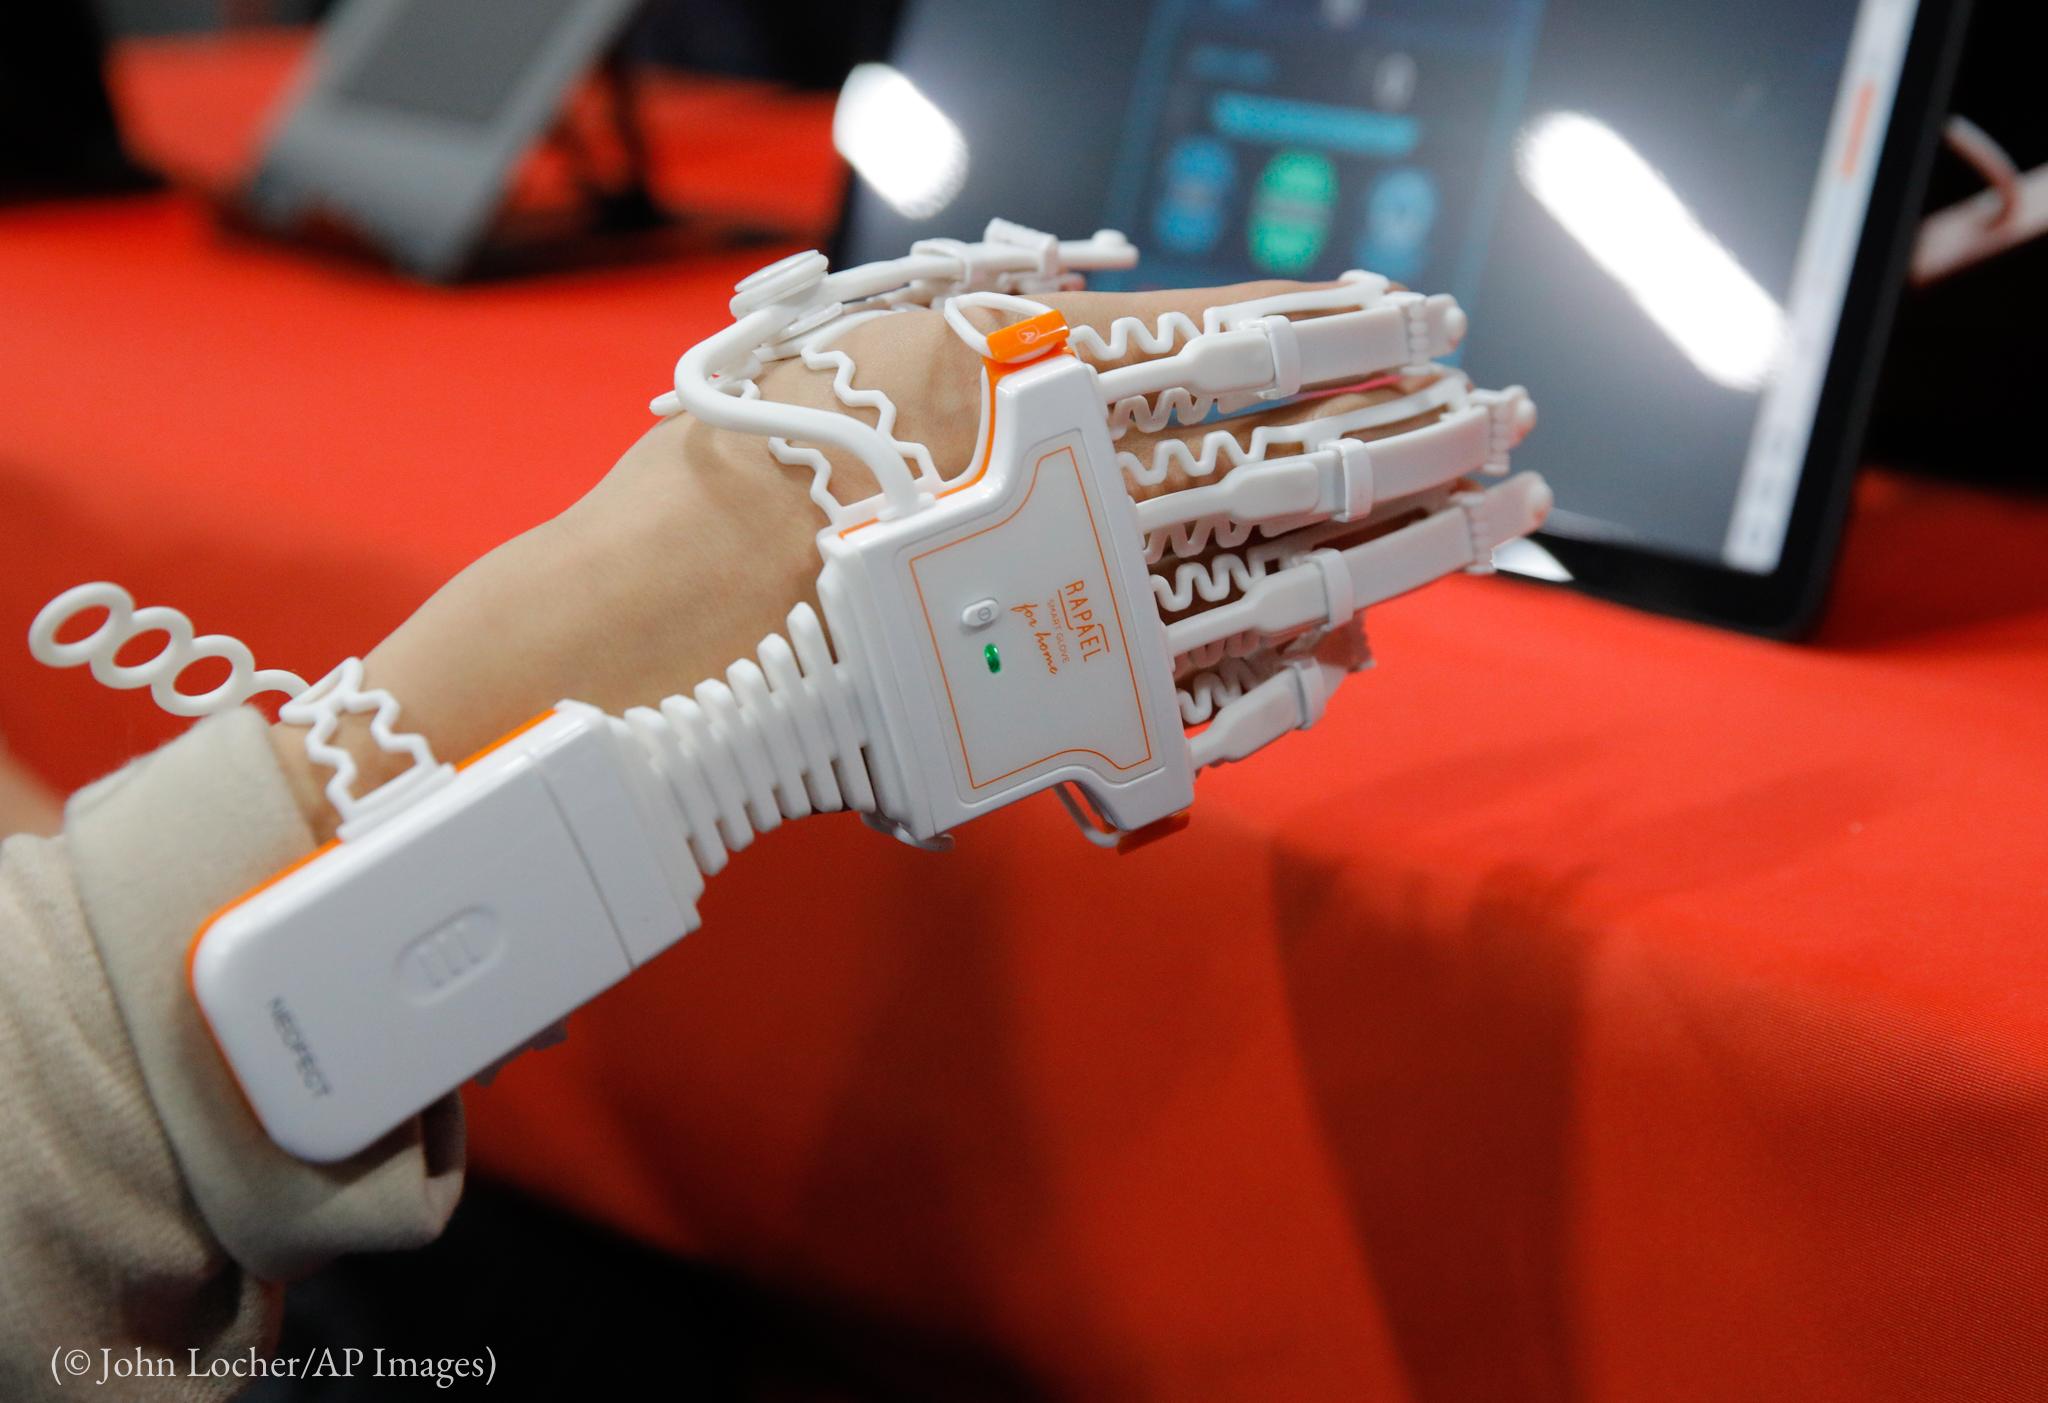 Tangan dengan teknologi menutupinya (© John Locher/AP Images)